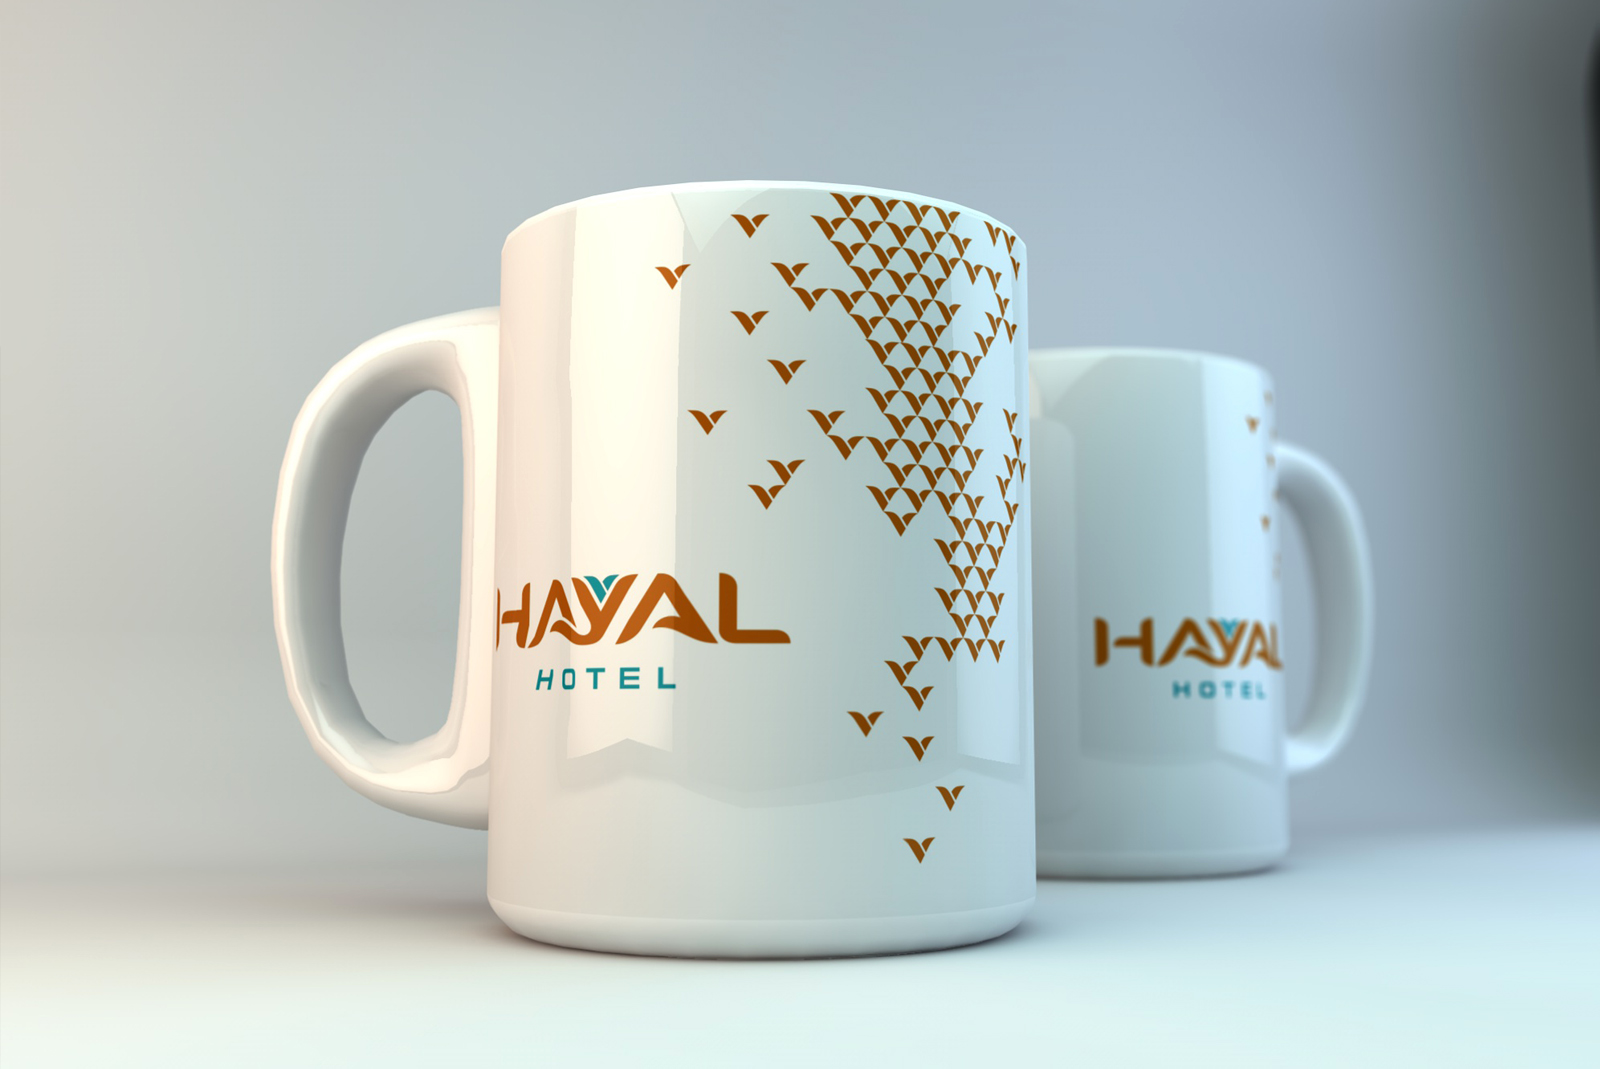 hayal_6